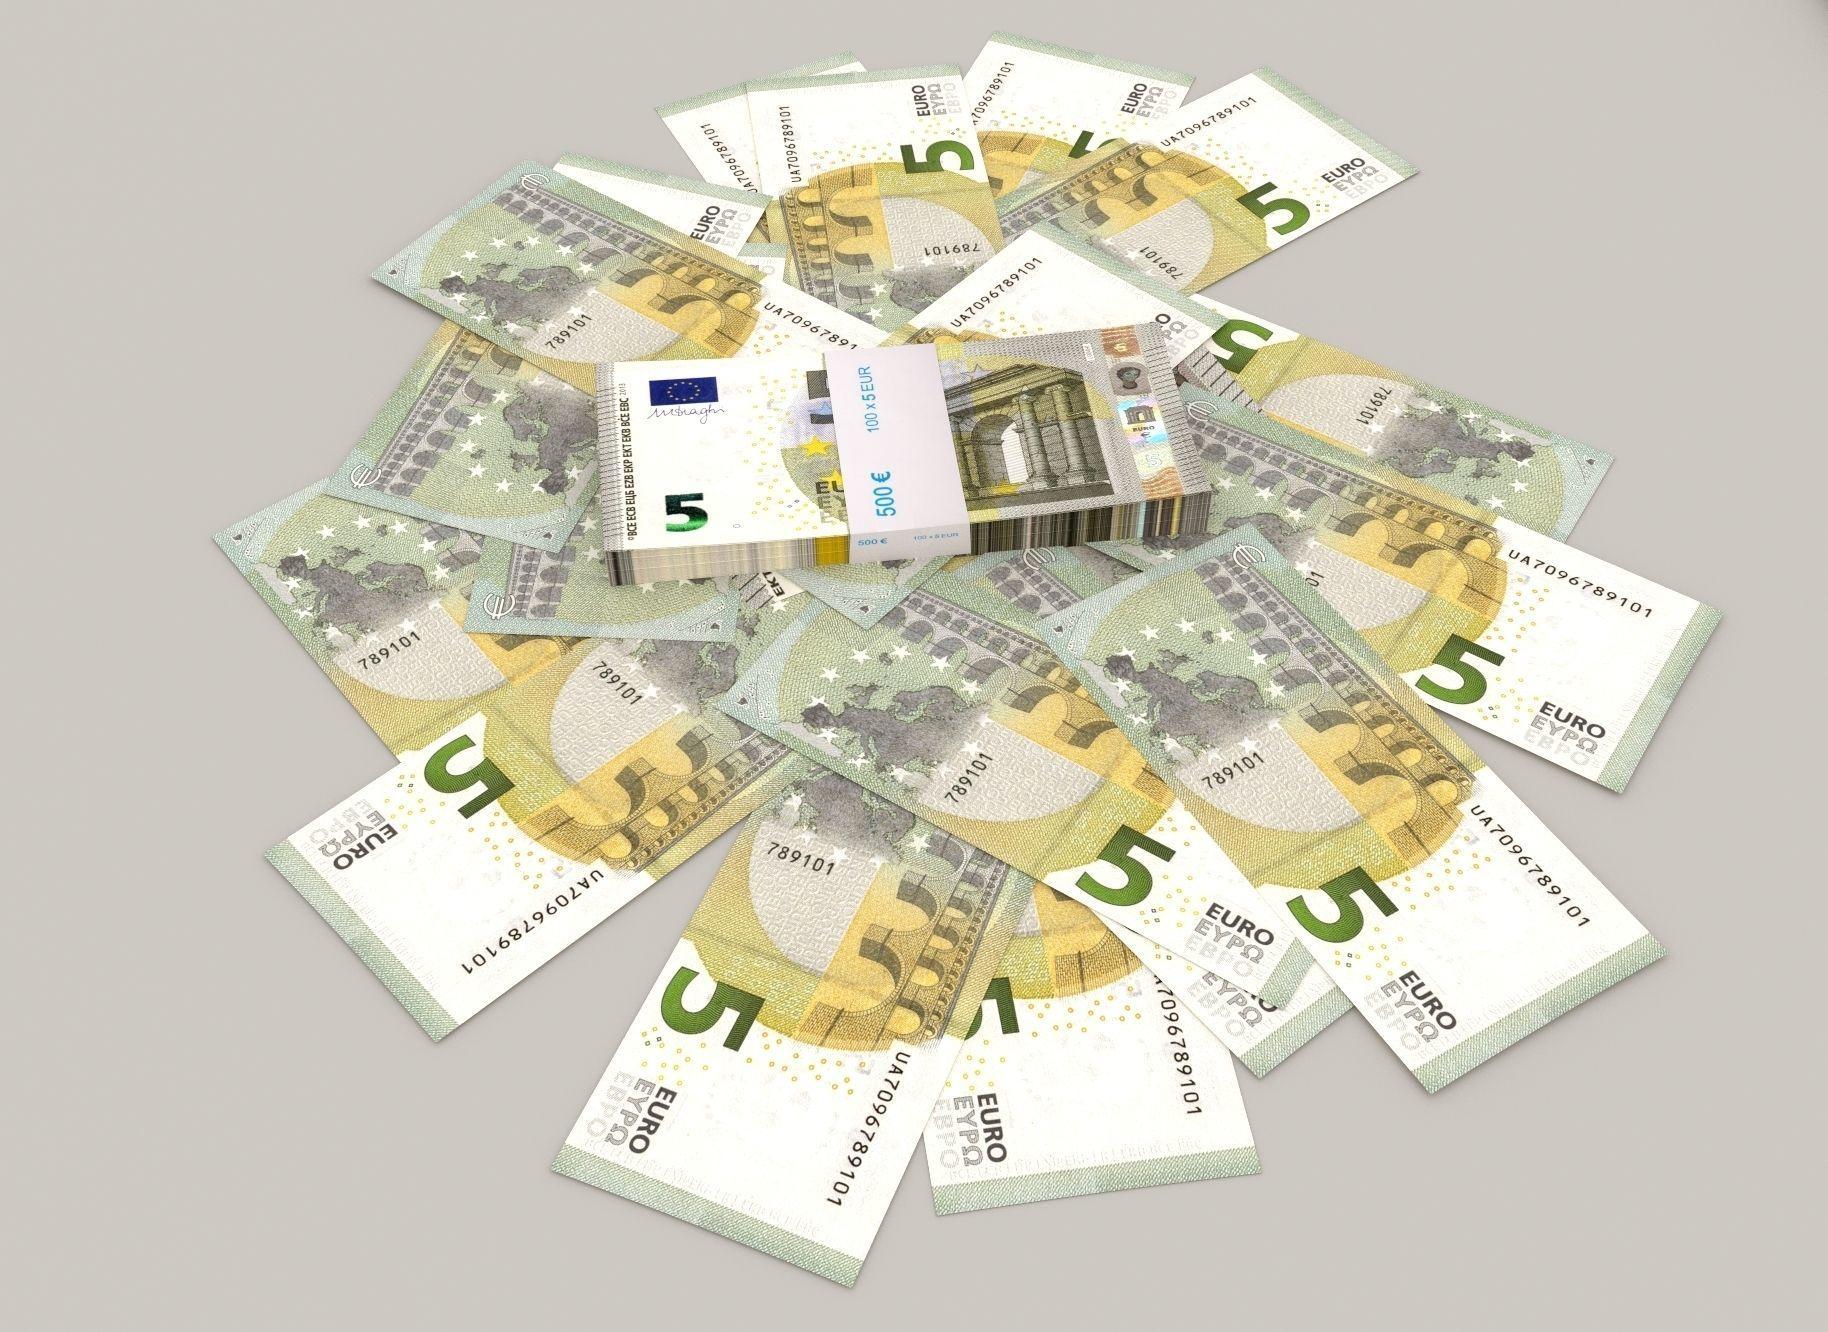 5 euro banknote packs